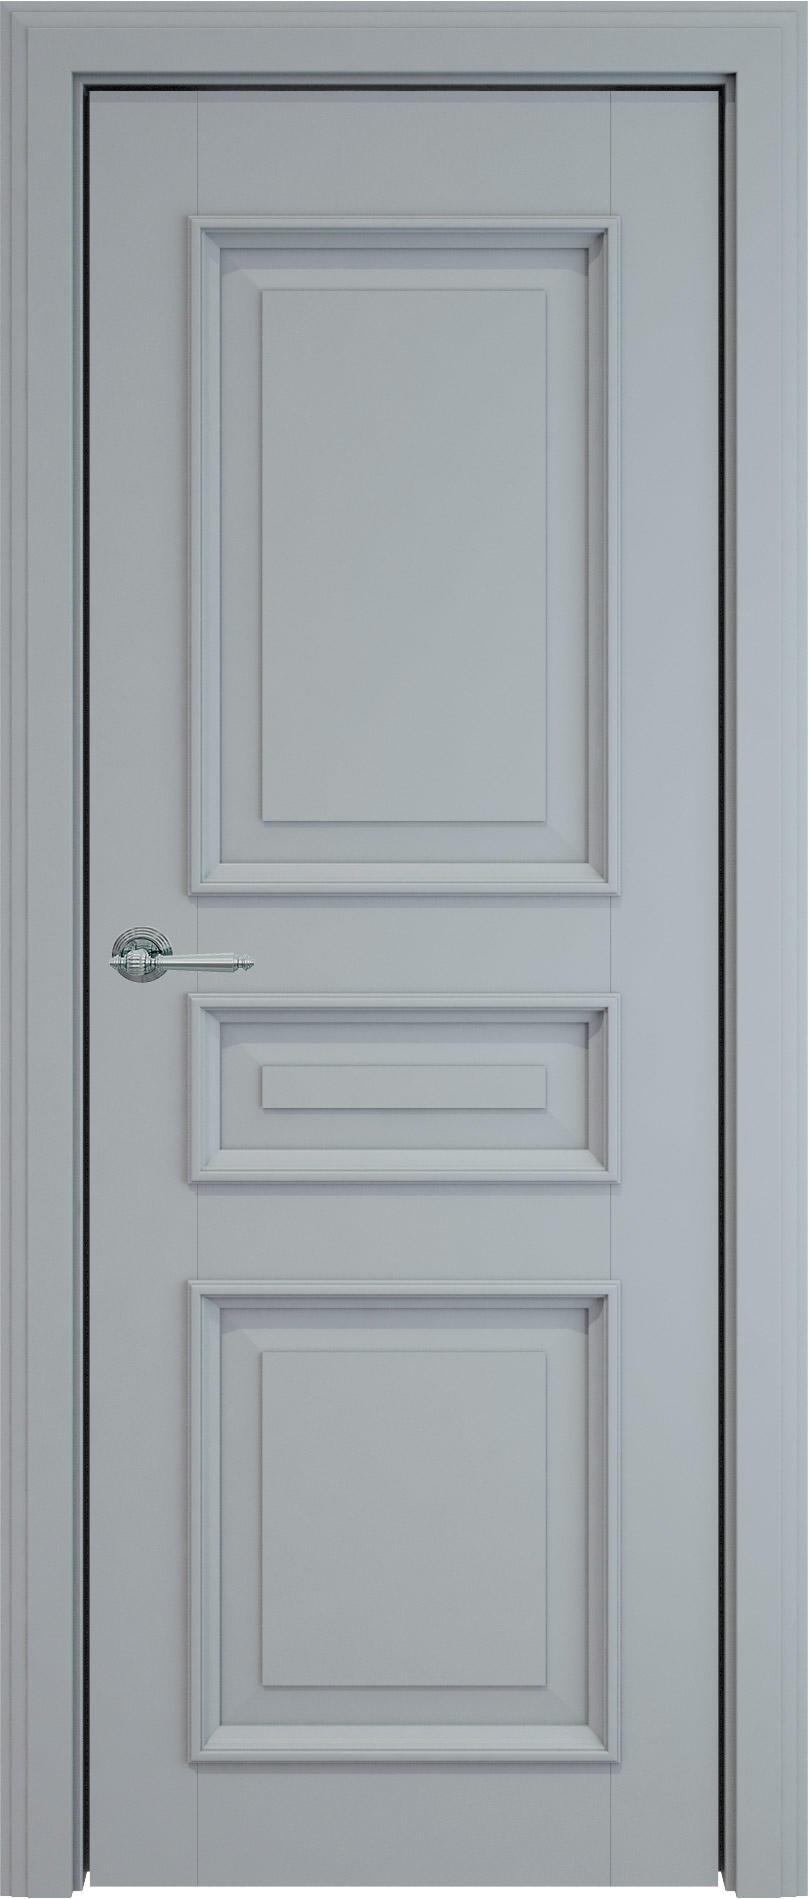 Imperia-R LUX цвет - Серебристо-серая эмаль (RAL 7045) Без стекла (ДГ)